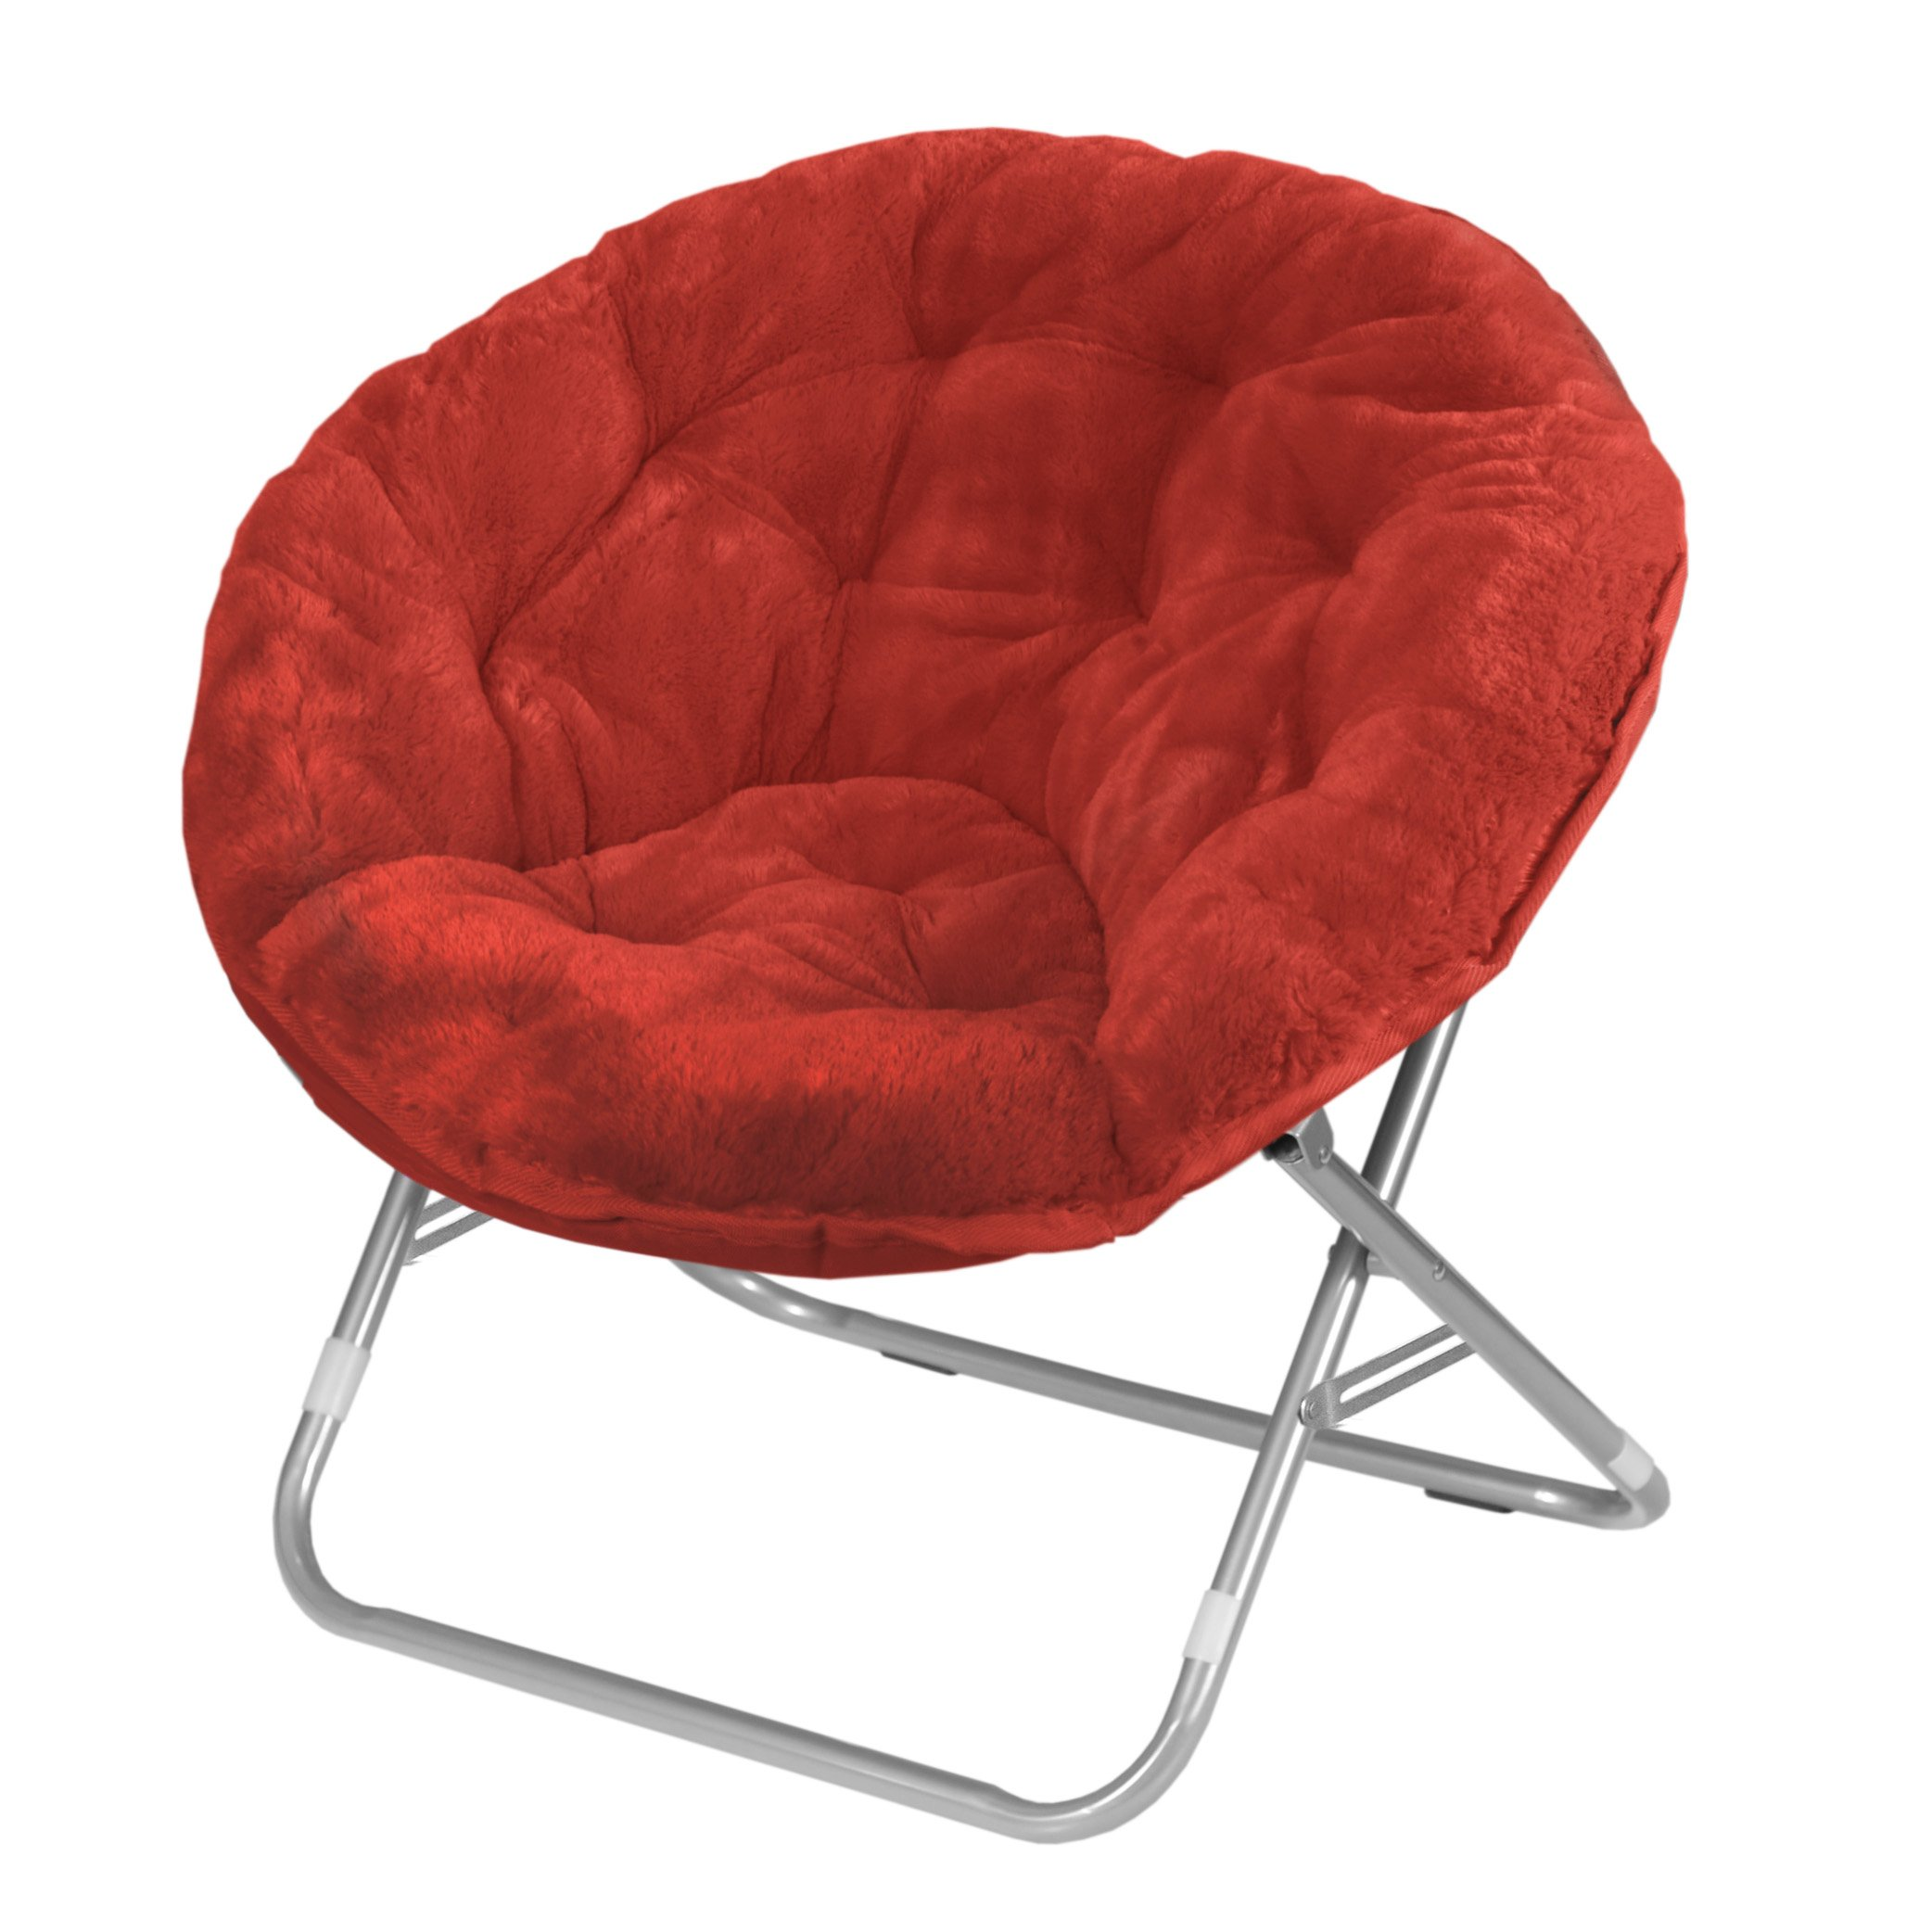 Urban Shop WK659843 Faux Fur Saucer Chair, Adult, Red by Urban Shop